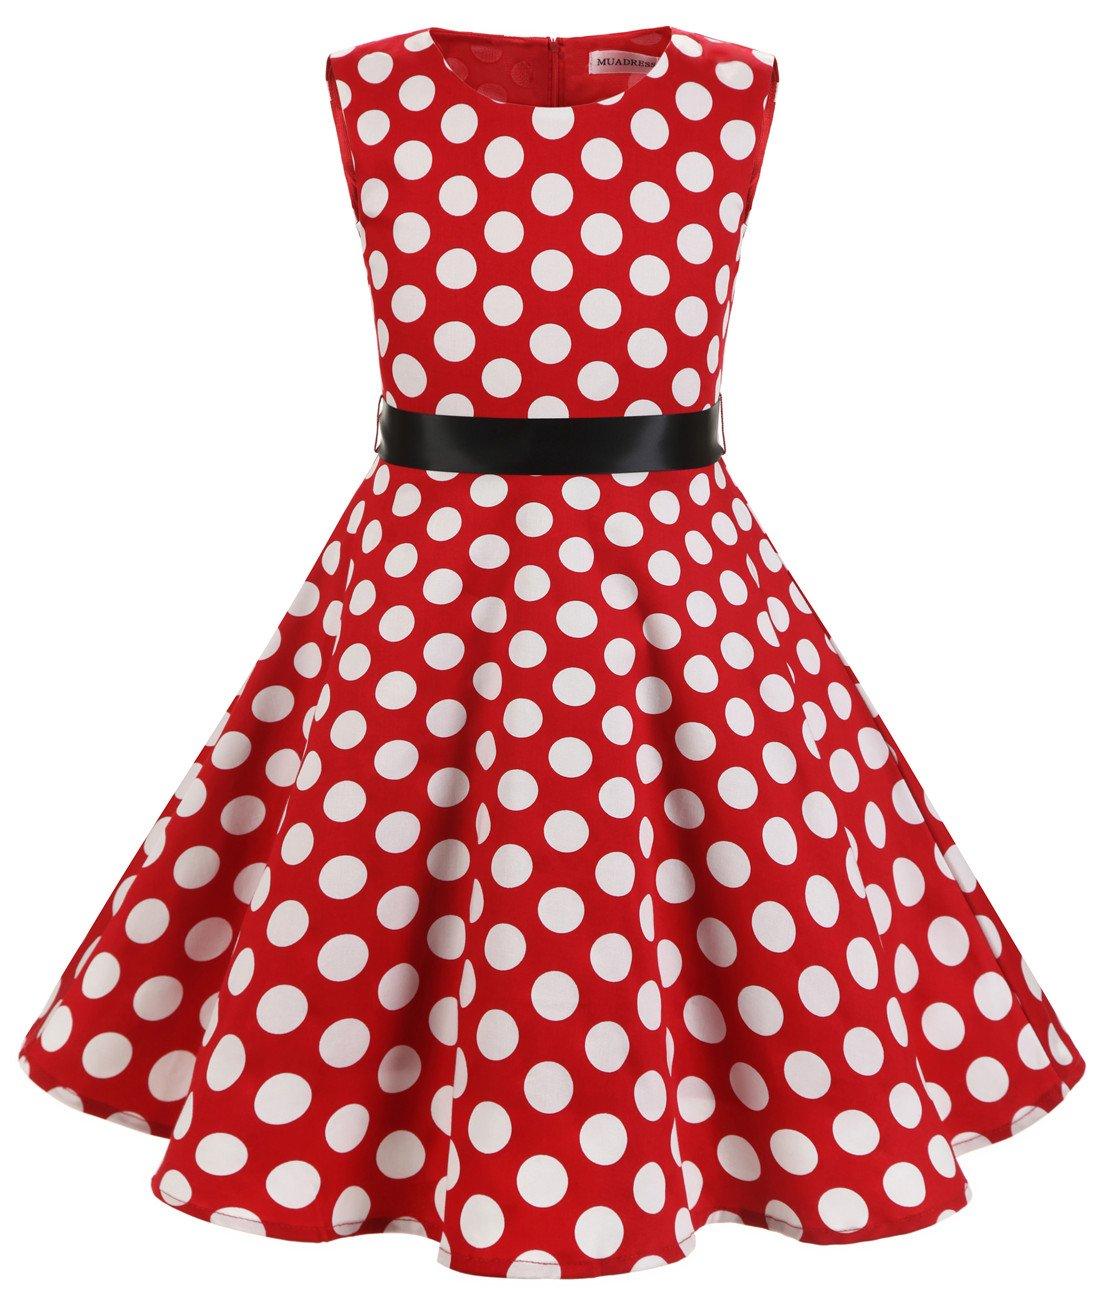 MUADRESS Girls Sleeveless O-Neck Audrey 1950s Vintage Swing Princess Easter Party Dress RedBigWhiteDot XL